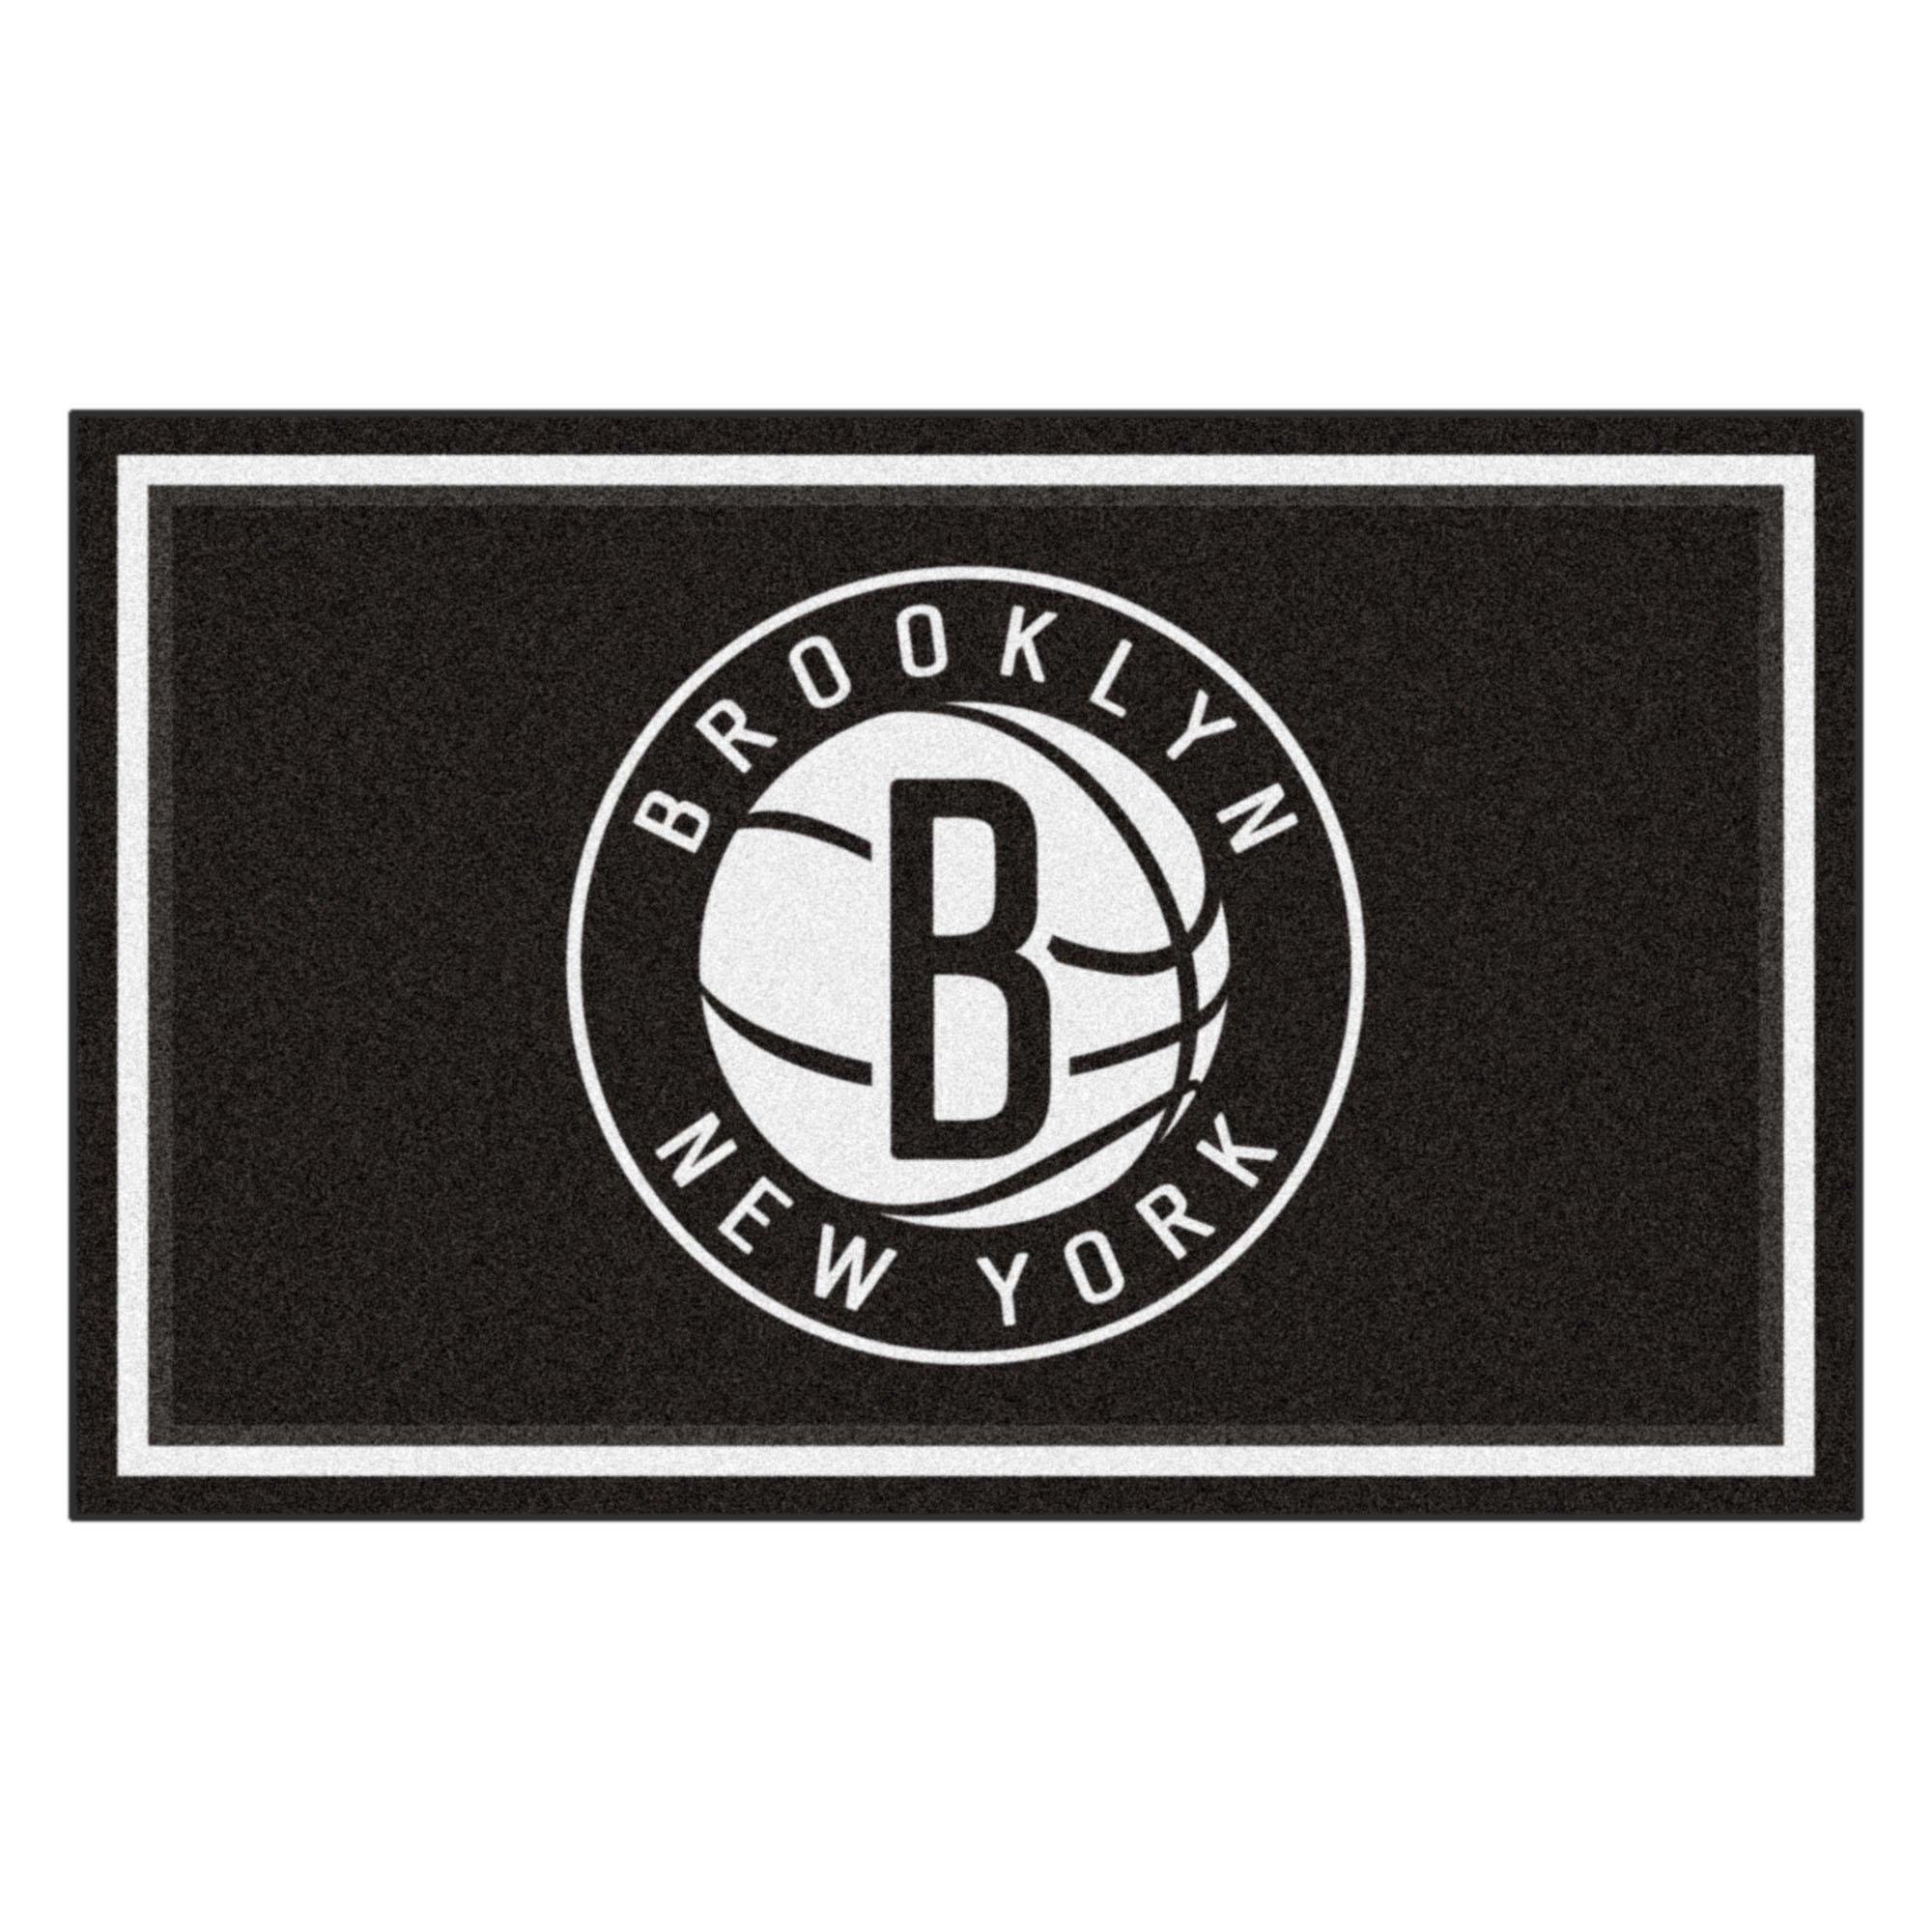 FANMATS 20420 44''x71'' Team Color NBA - Brooklyn Nets Rug by Fanmats